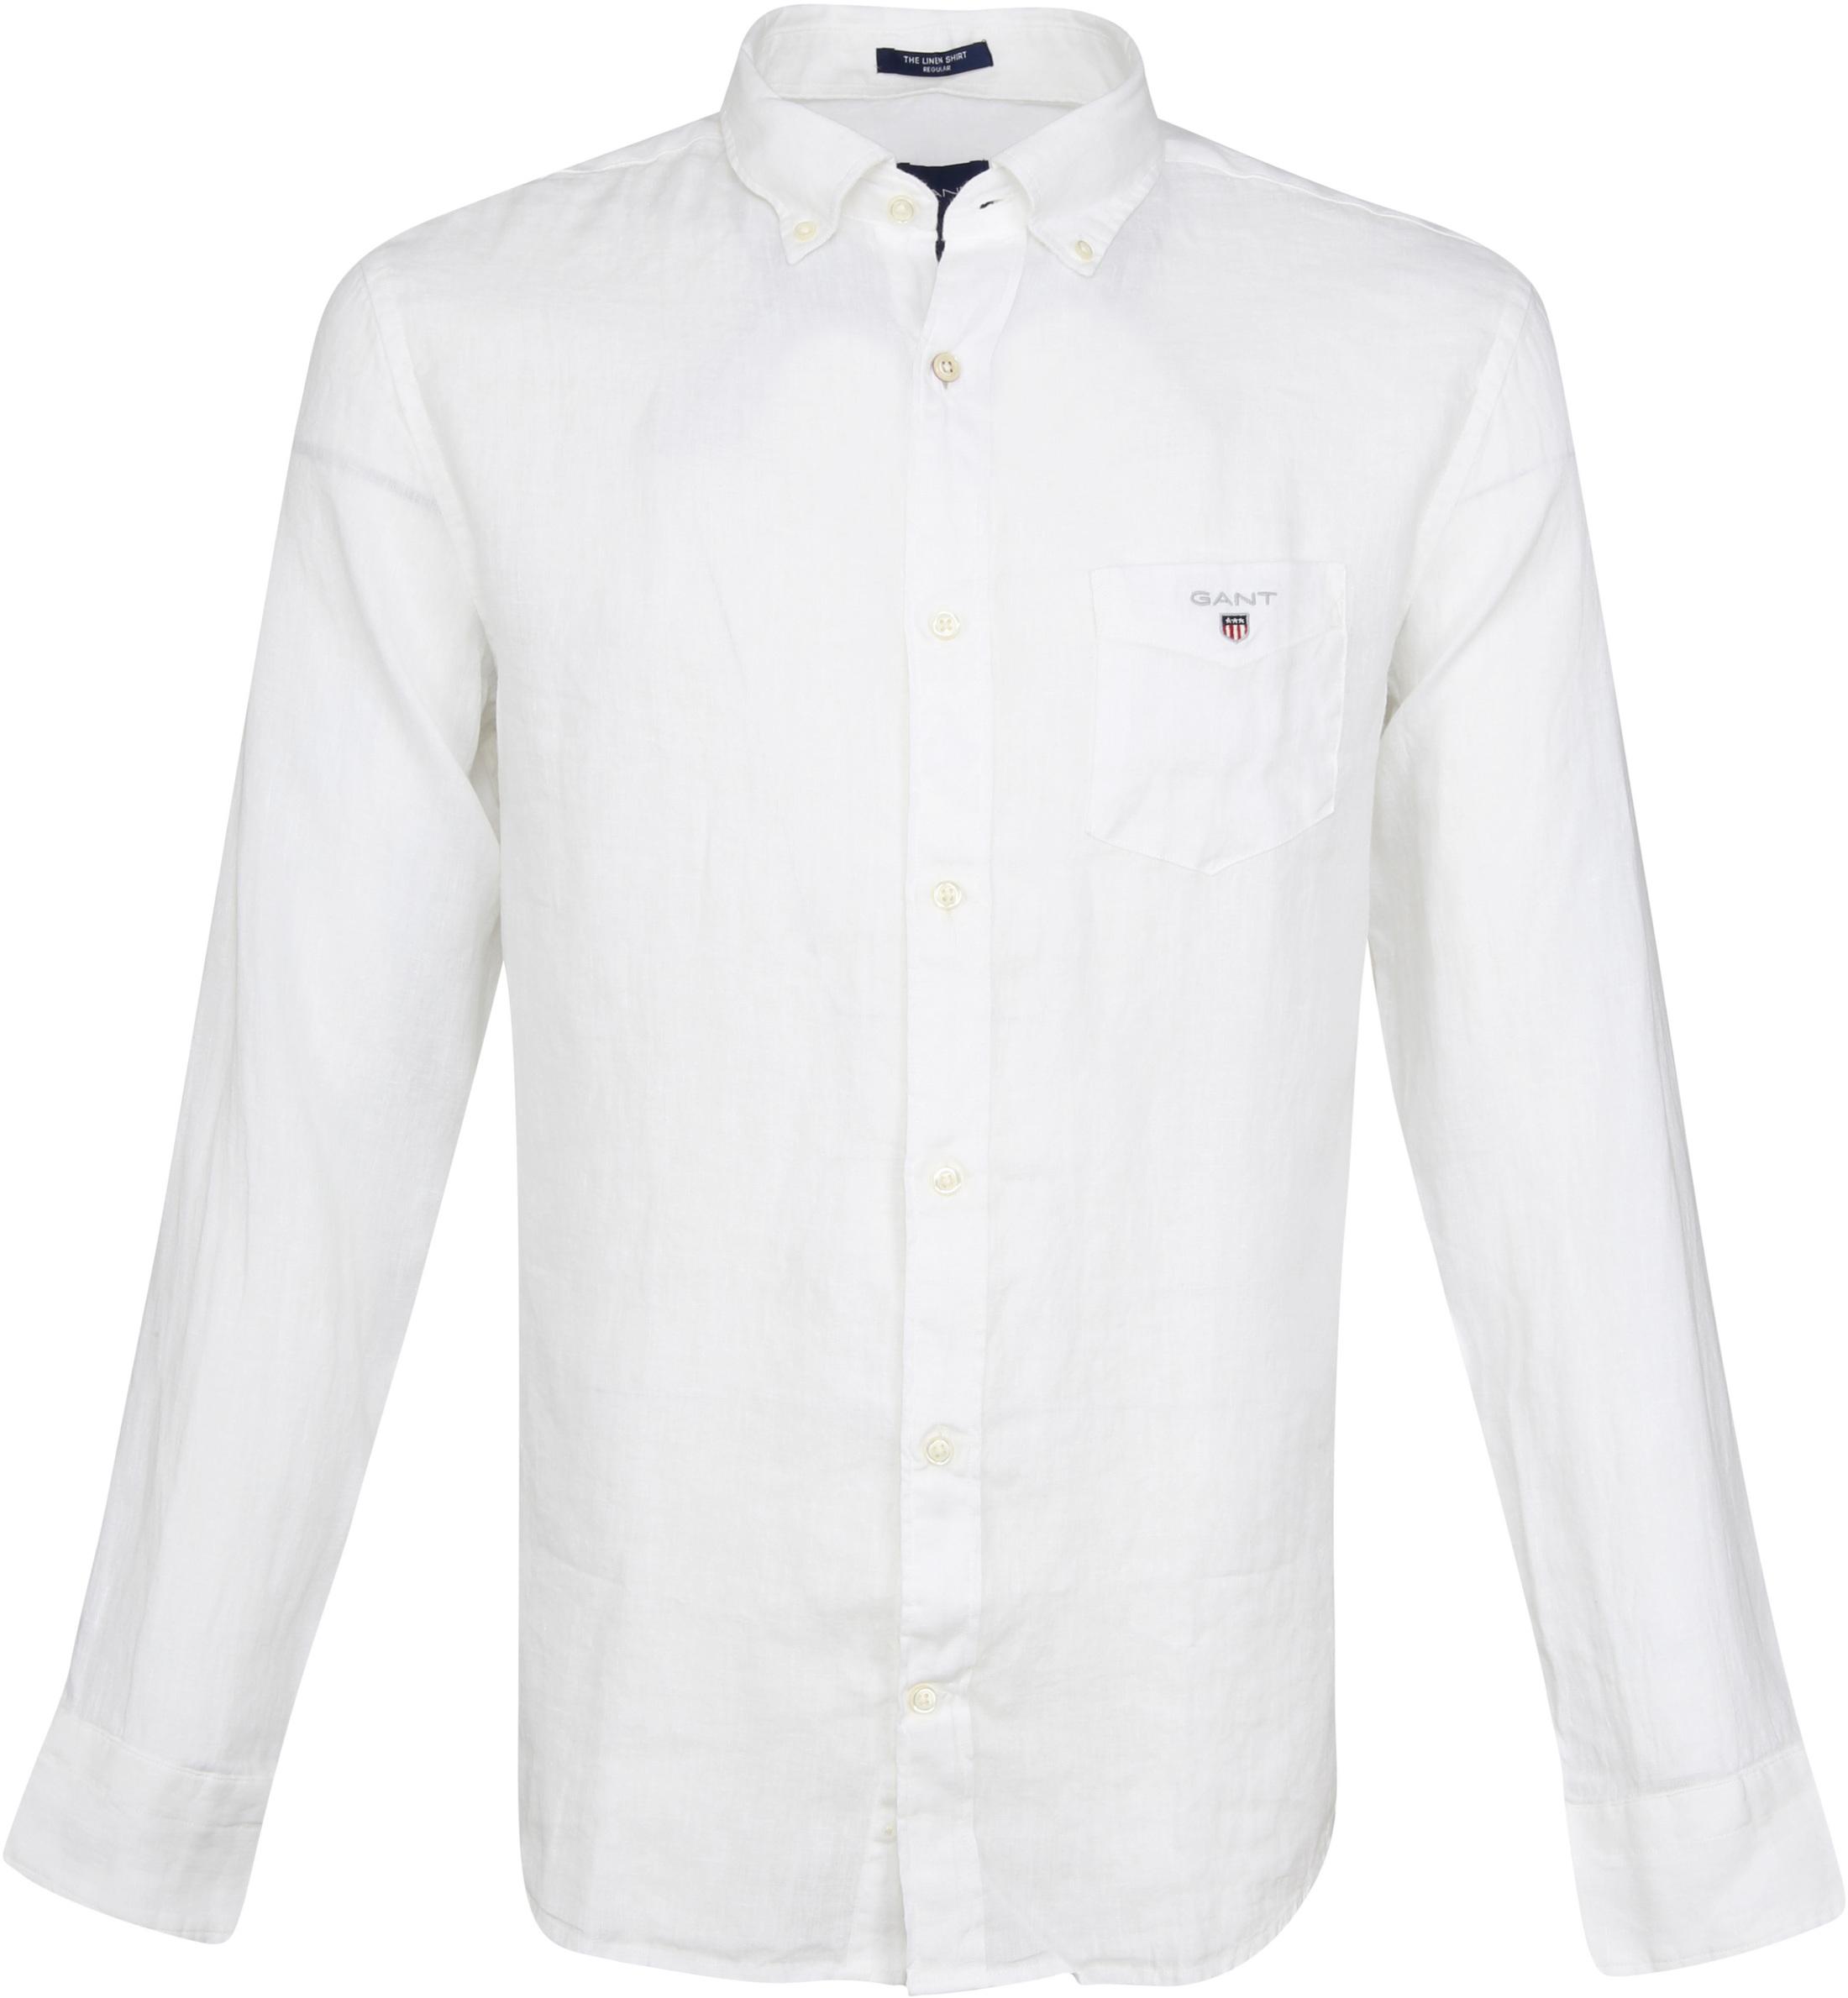 Gant Casual Overhemd Linnen Wit foto 0